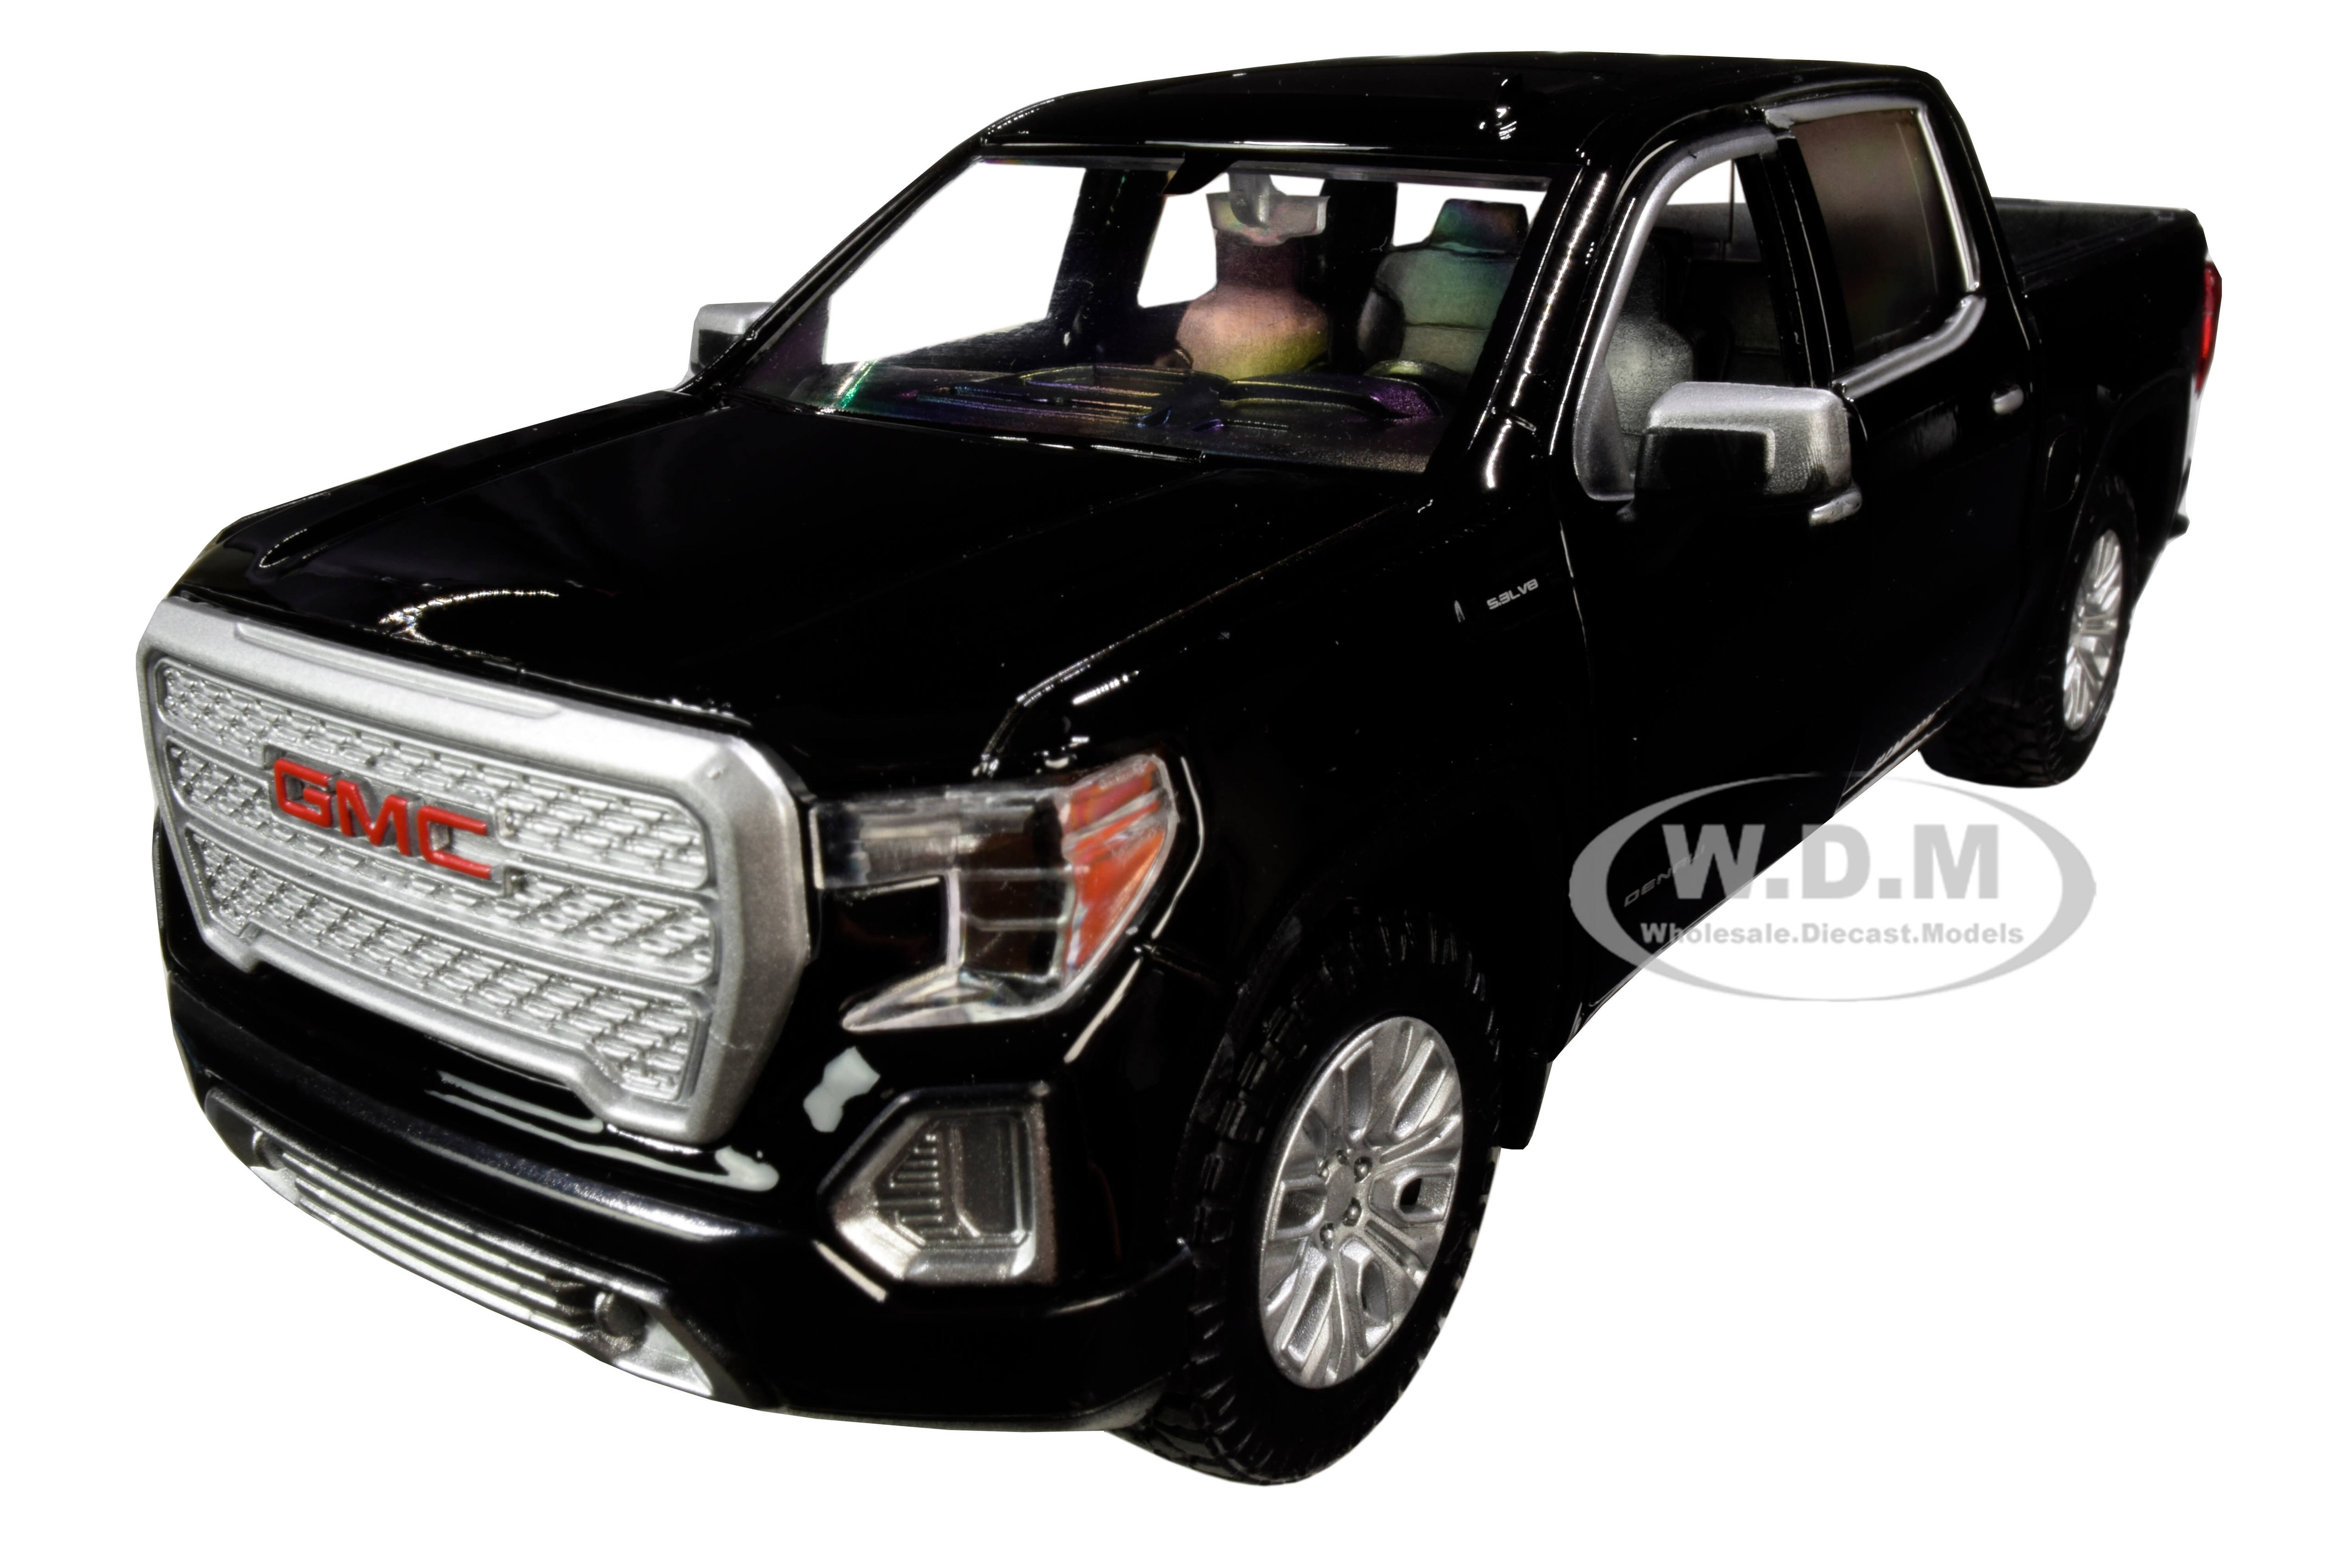 2019 GMC Sierra 1500 Denali Crew Cab Pickup Truck Black 1/24-1/27 Diecast Model Car by Motormax